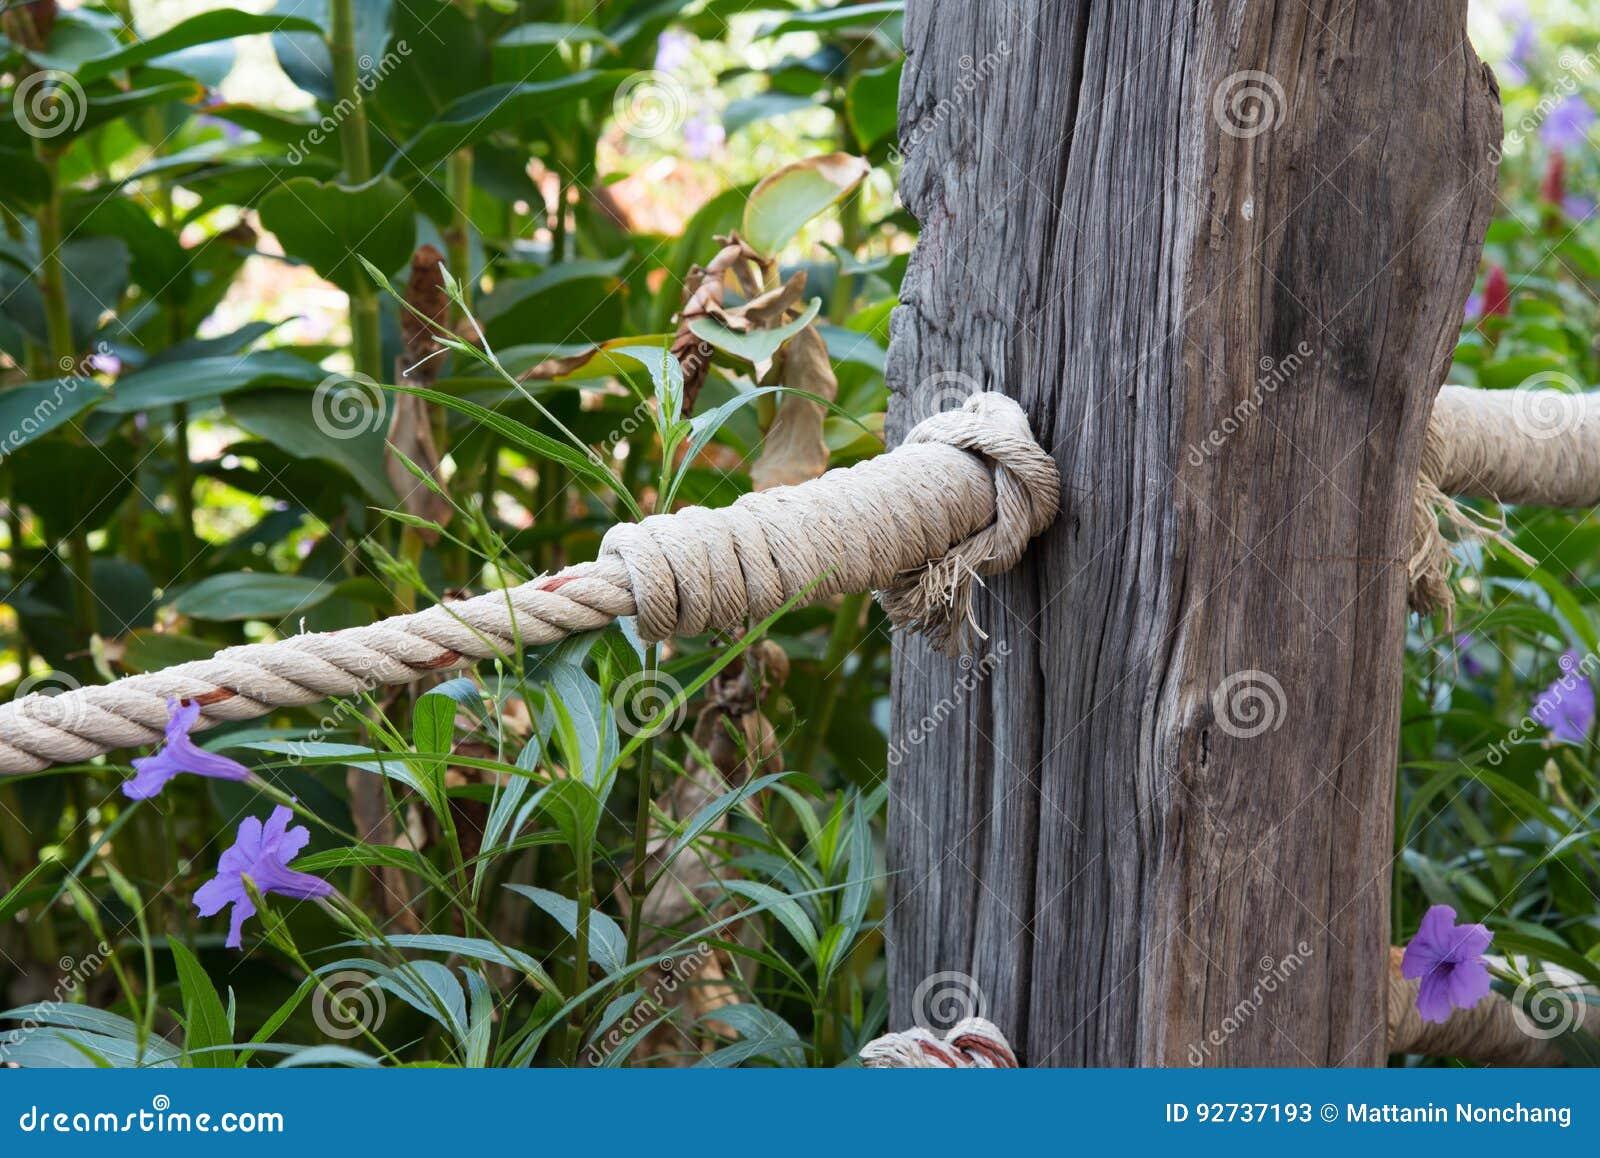 corde en bois de barri re et de noeud photo stock image 92737193. Black Bedroom Furniture Sets. Home Design Ideas